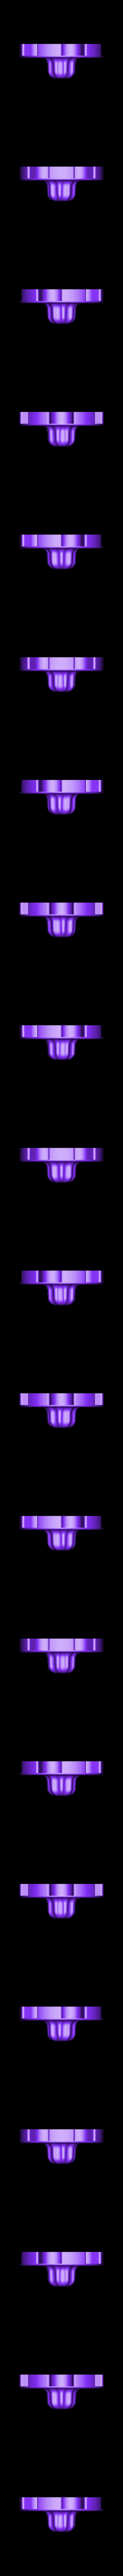 roue_5.stl Download free STL file Pocket Downfall - 10 de chute de poche • Design to 3D print, lipki